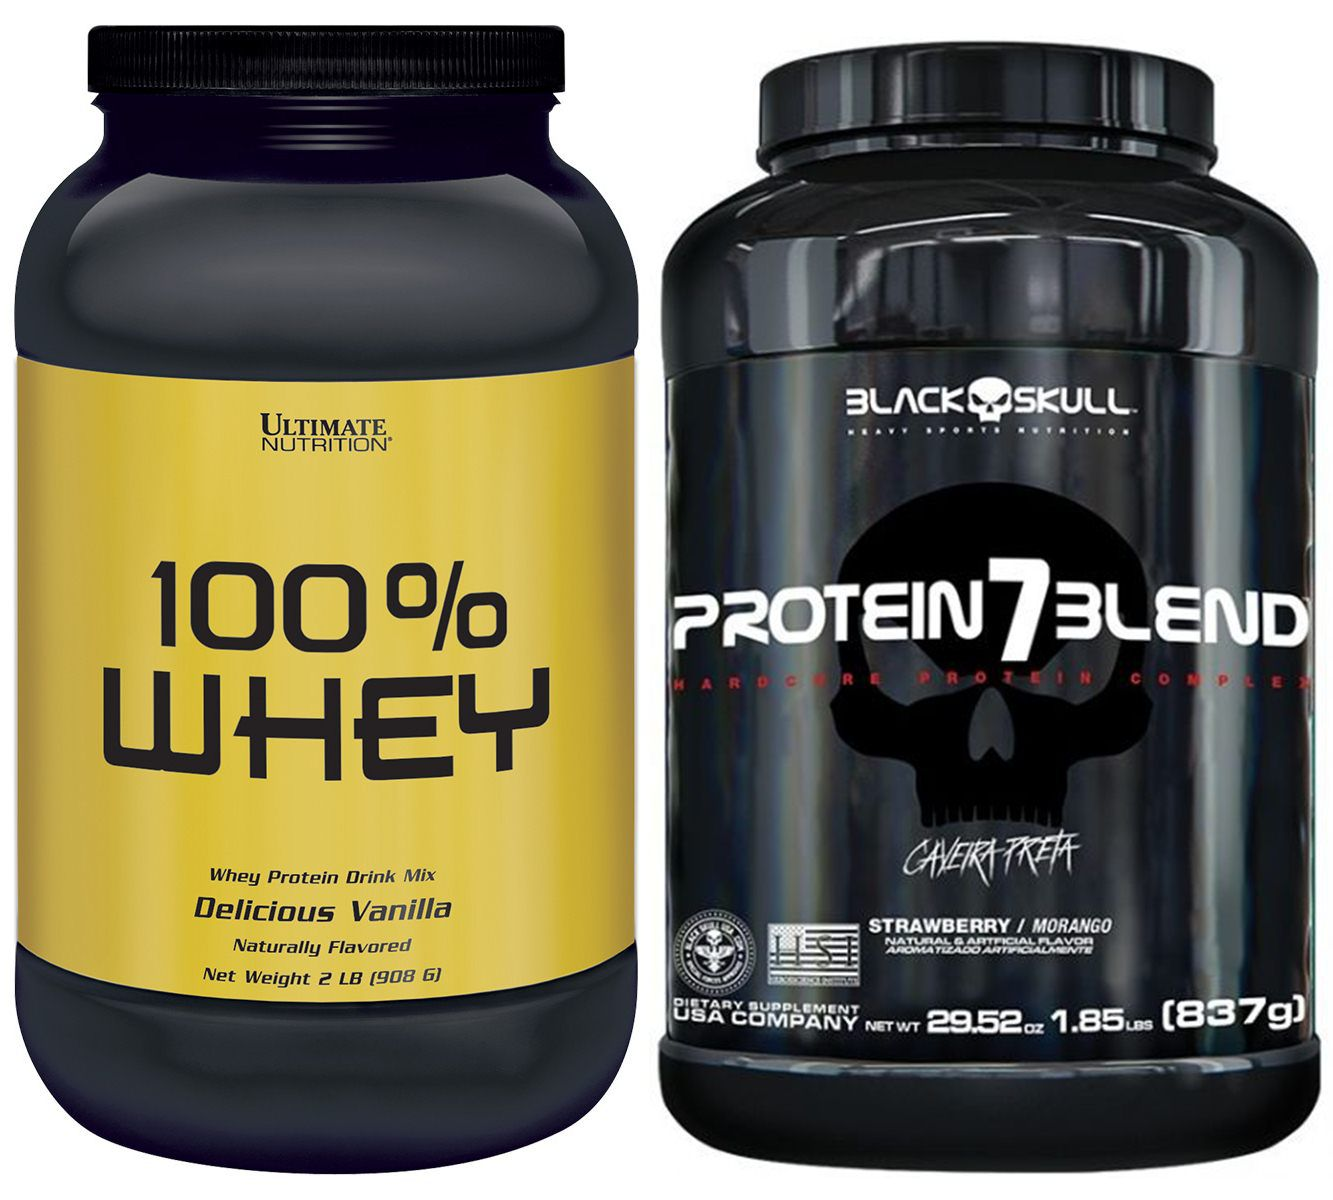 KIT: Protein 7 Blend 837g + Whey Protein 100% 2lbs